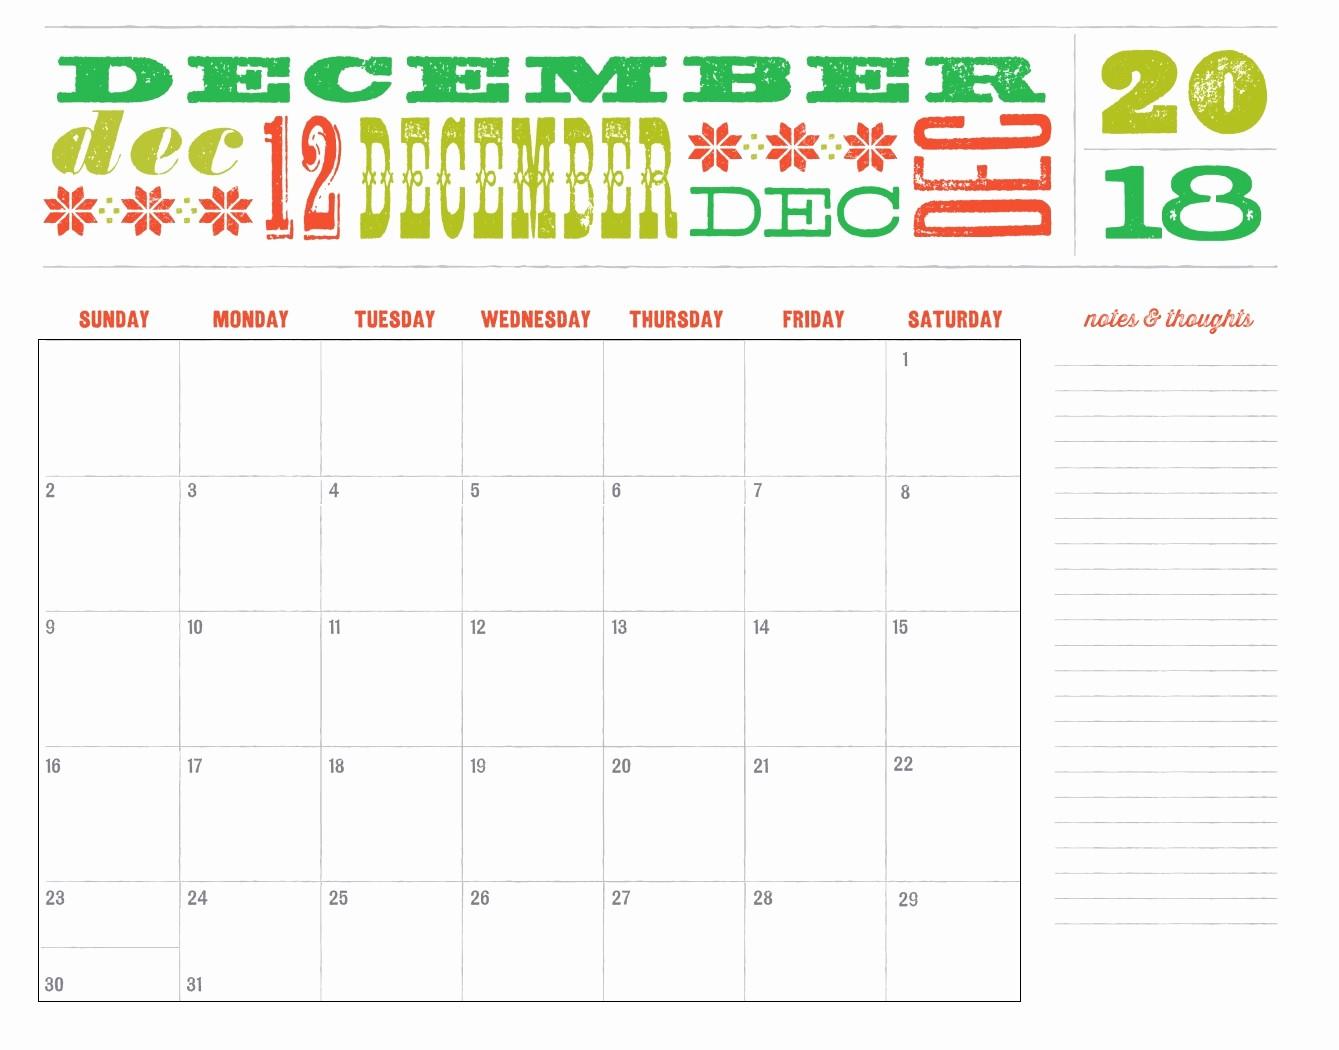 2018 Month by Month Calendar Luxury Twelve 12 Months 2018 Calendar